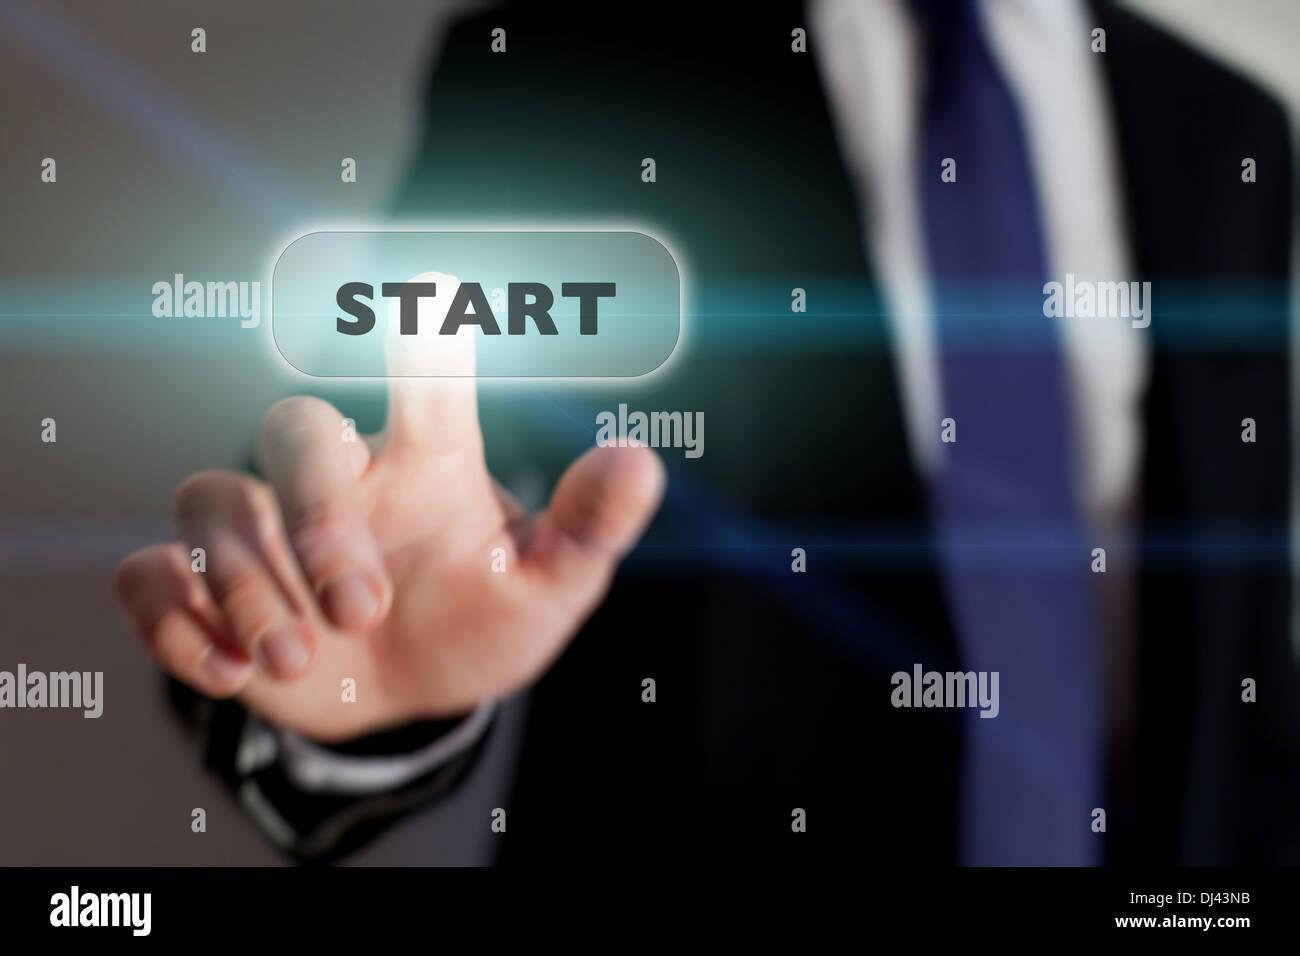 Starten Sie neue Business Konzept Stockbild